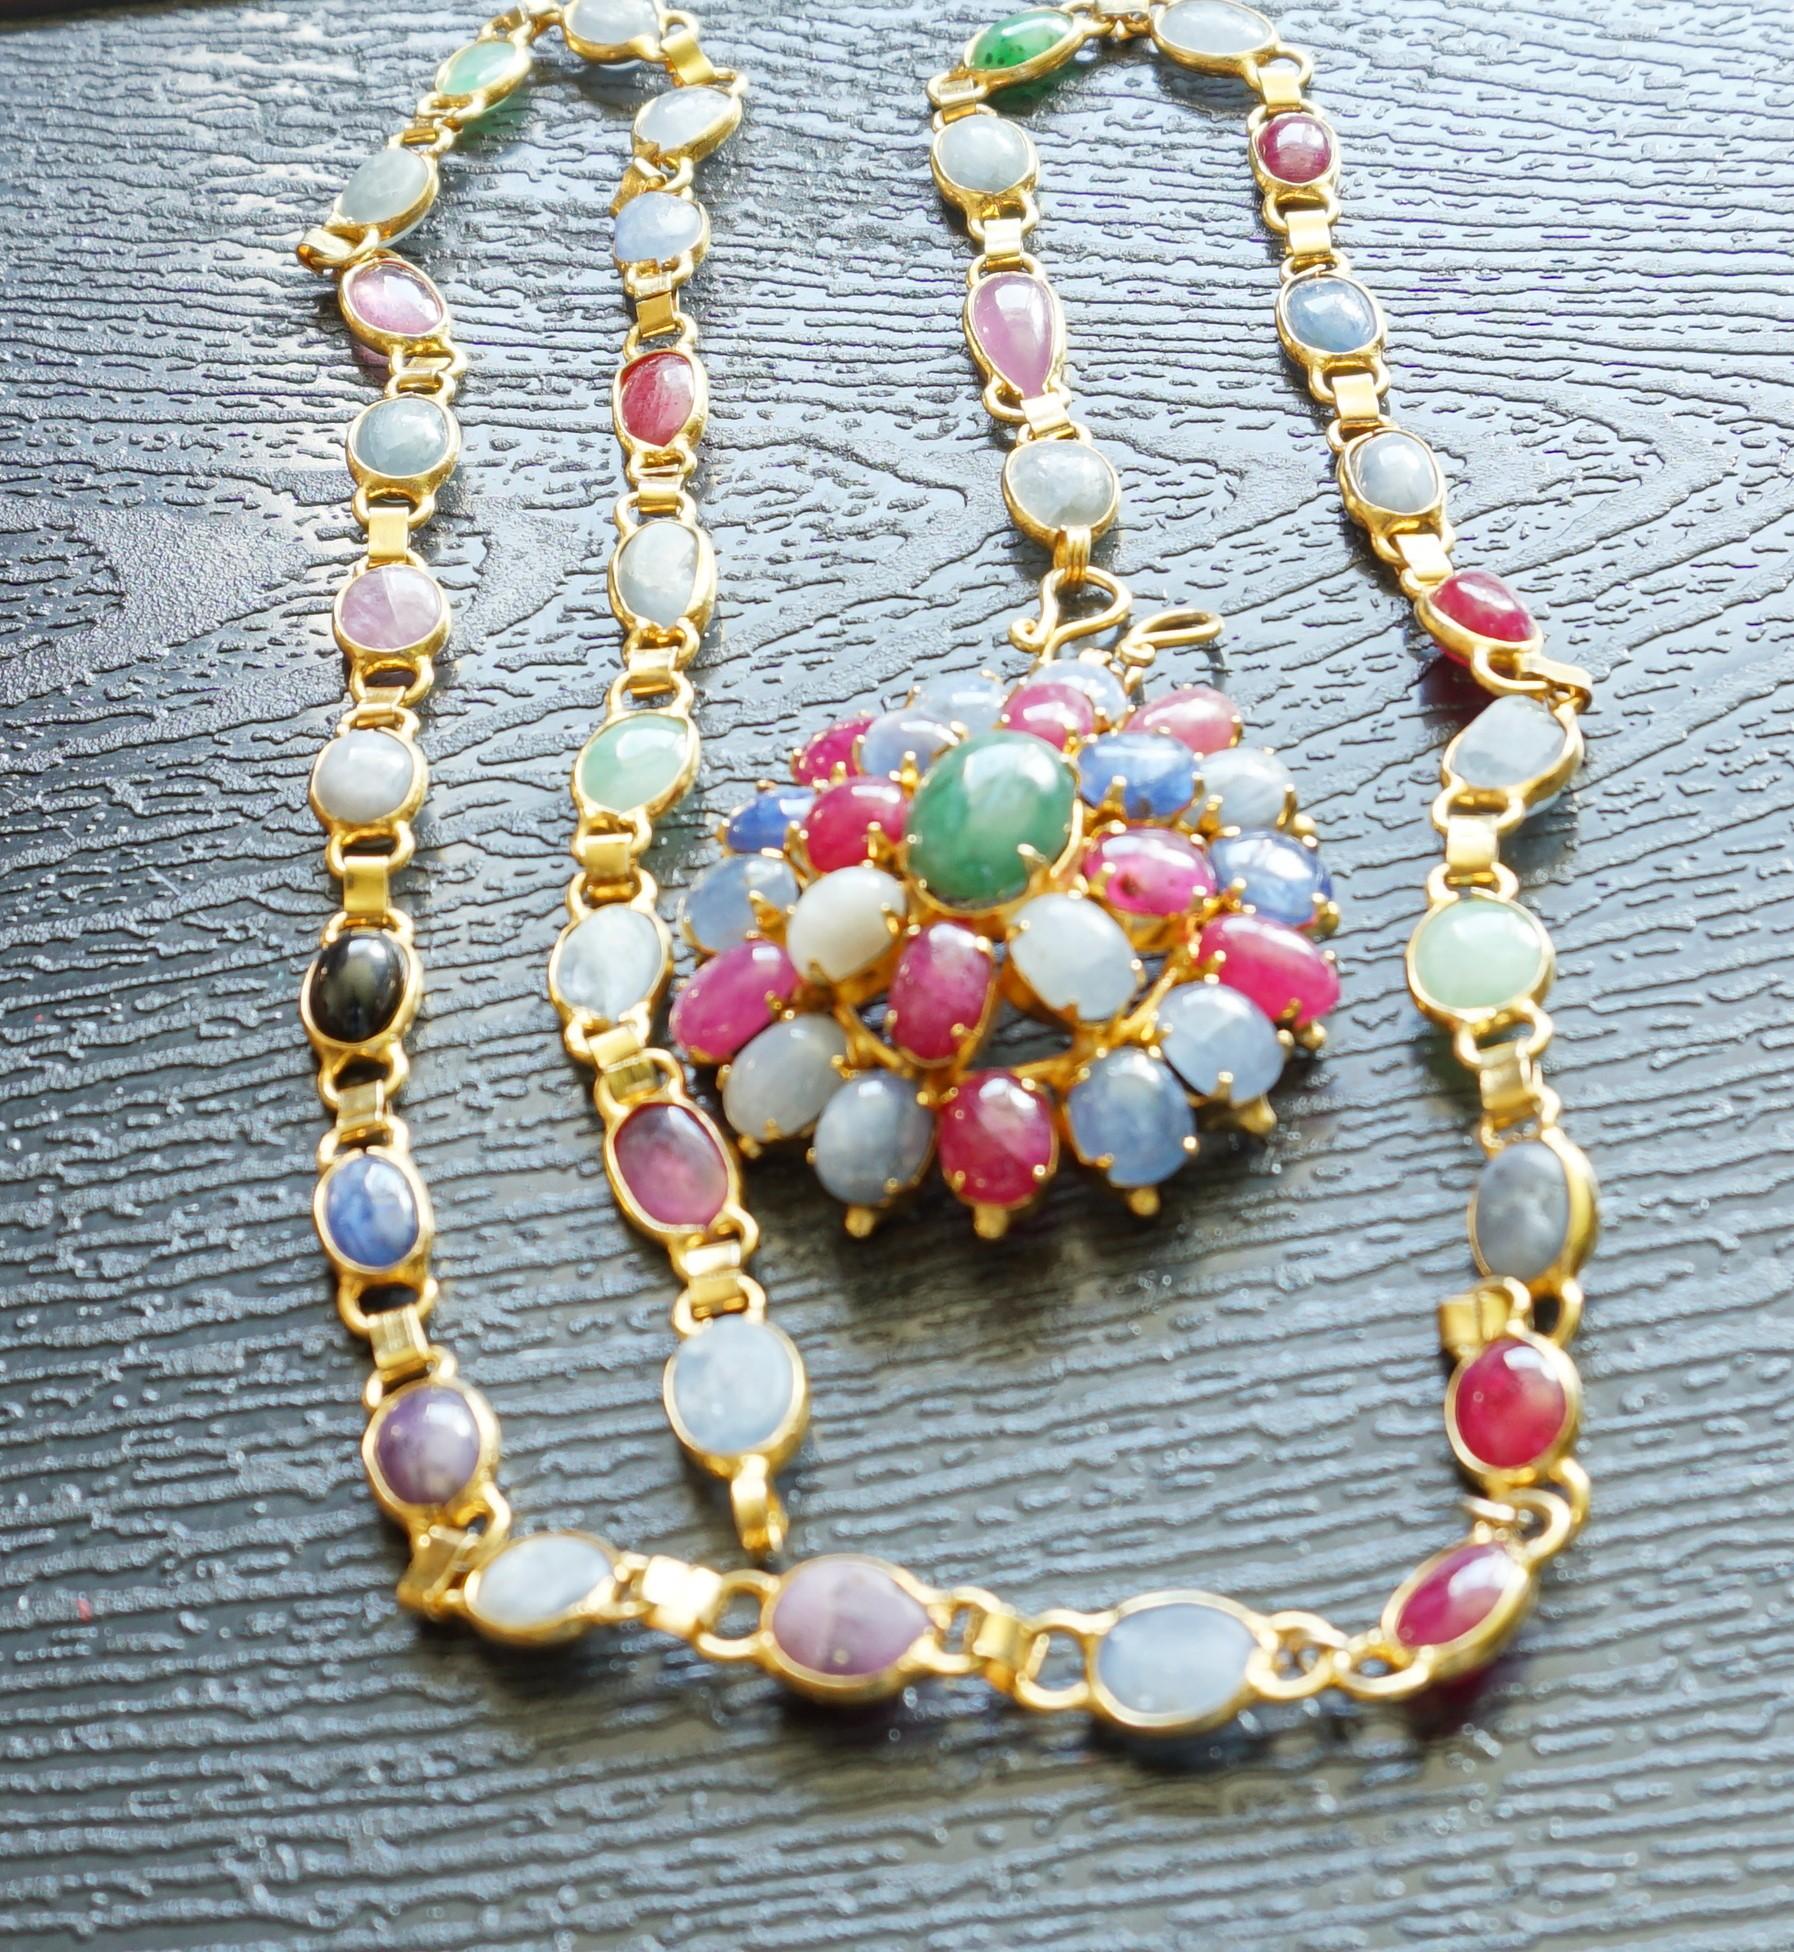 Unusual testing as diamonds sapphires and rubies - Gem